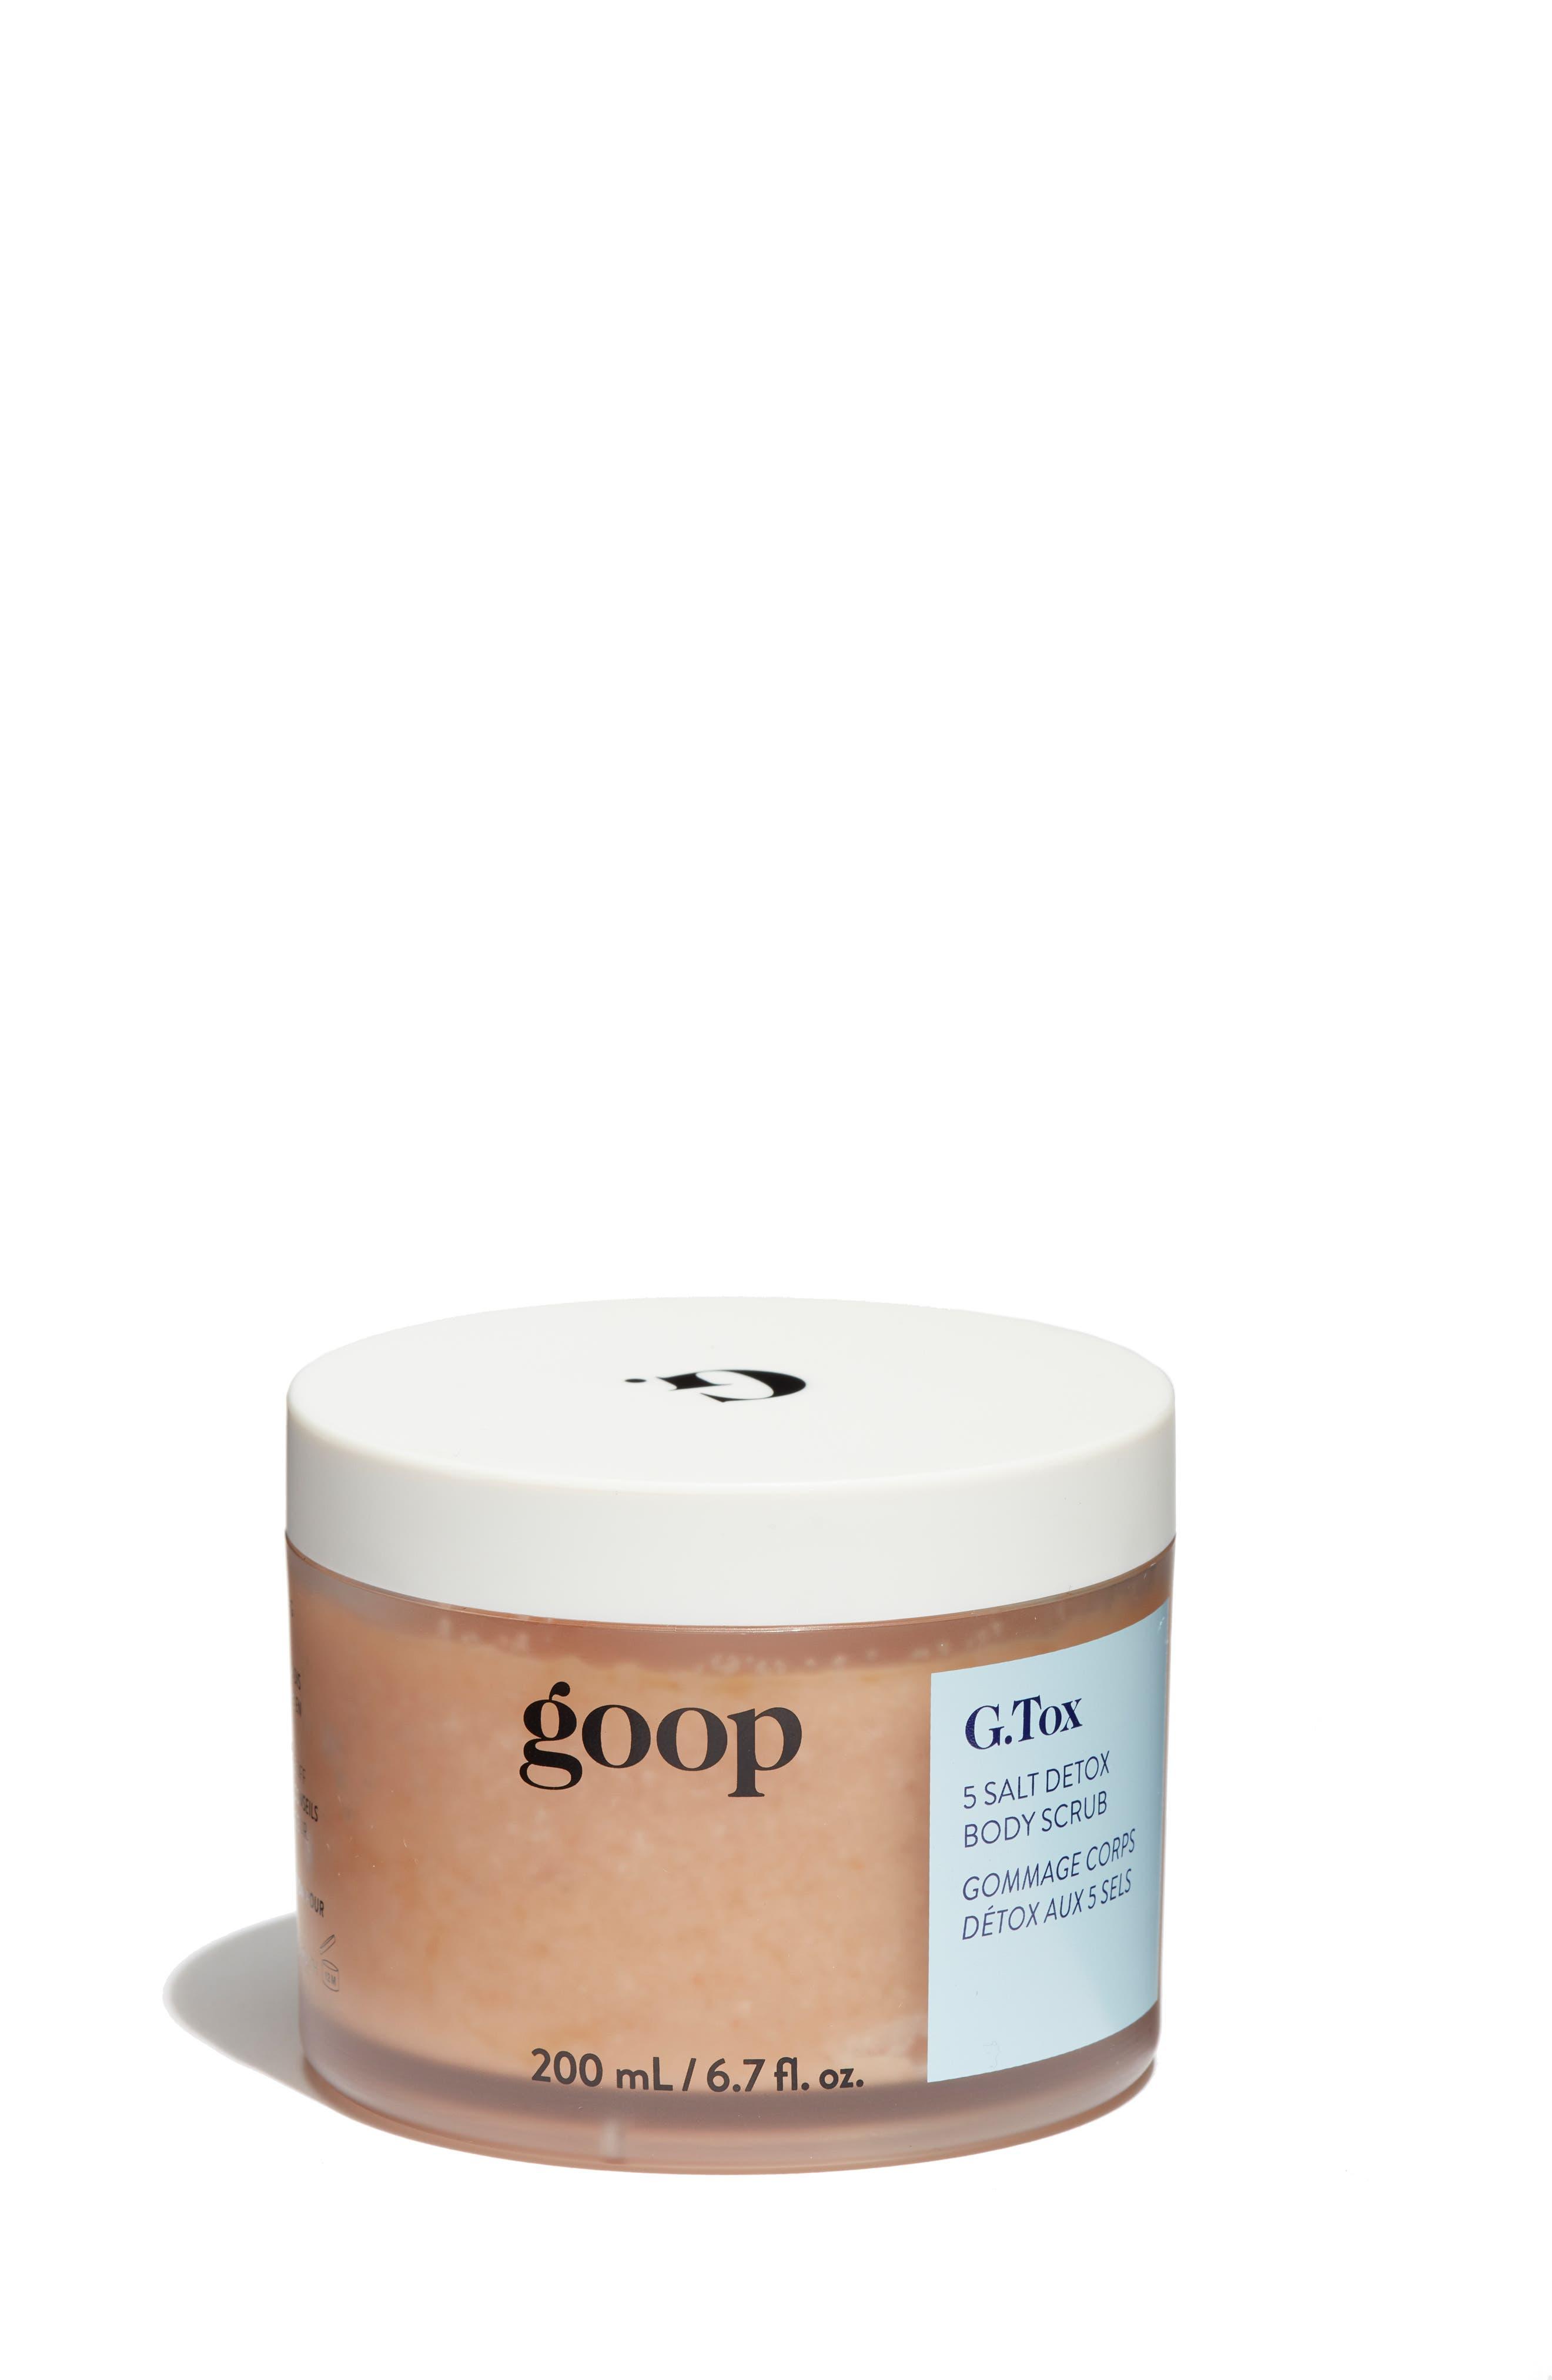 G.Tox 5 Salt Detox Body Scrub,                             Main thumbnail 1, color,                             960